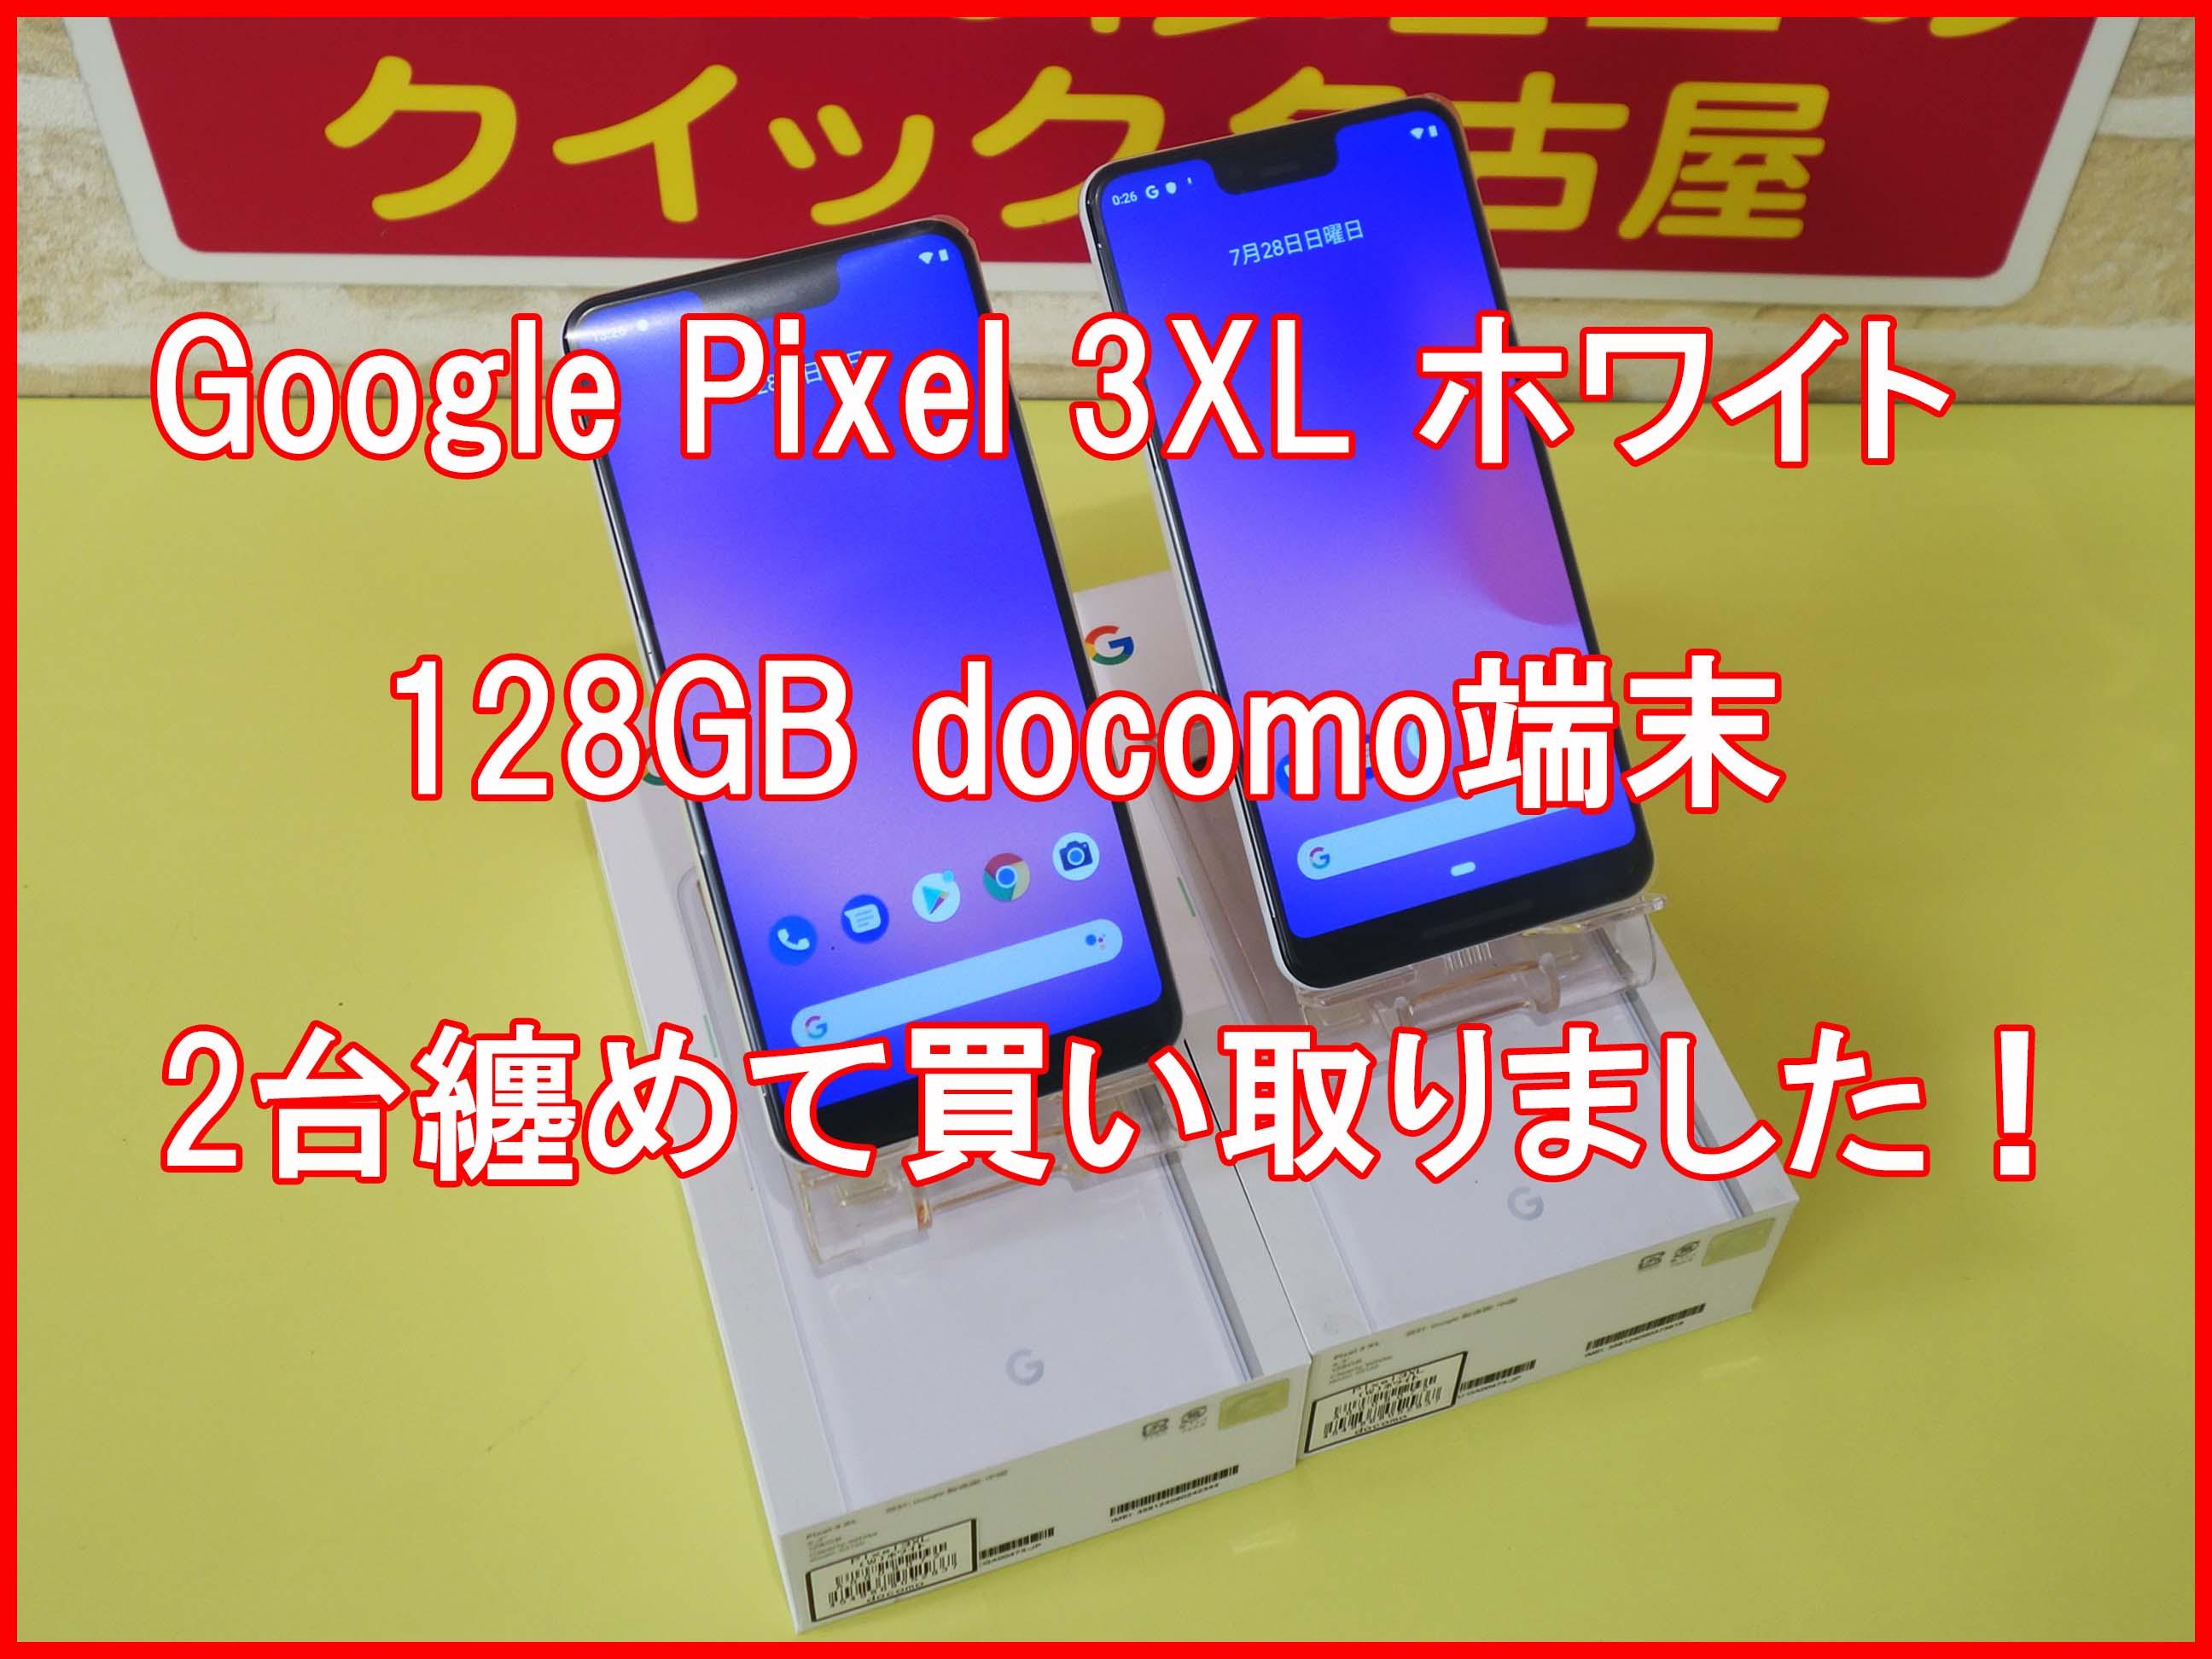 Google pixel買取クイック名古屋